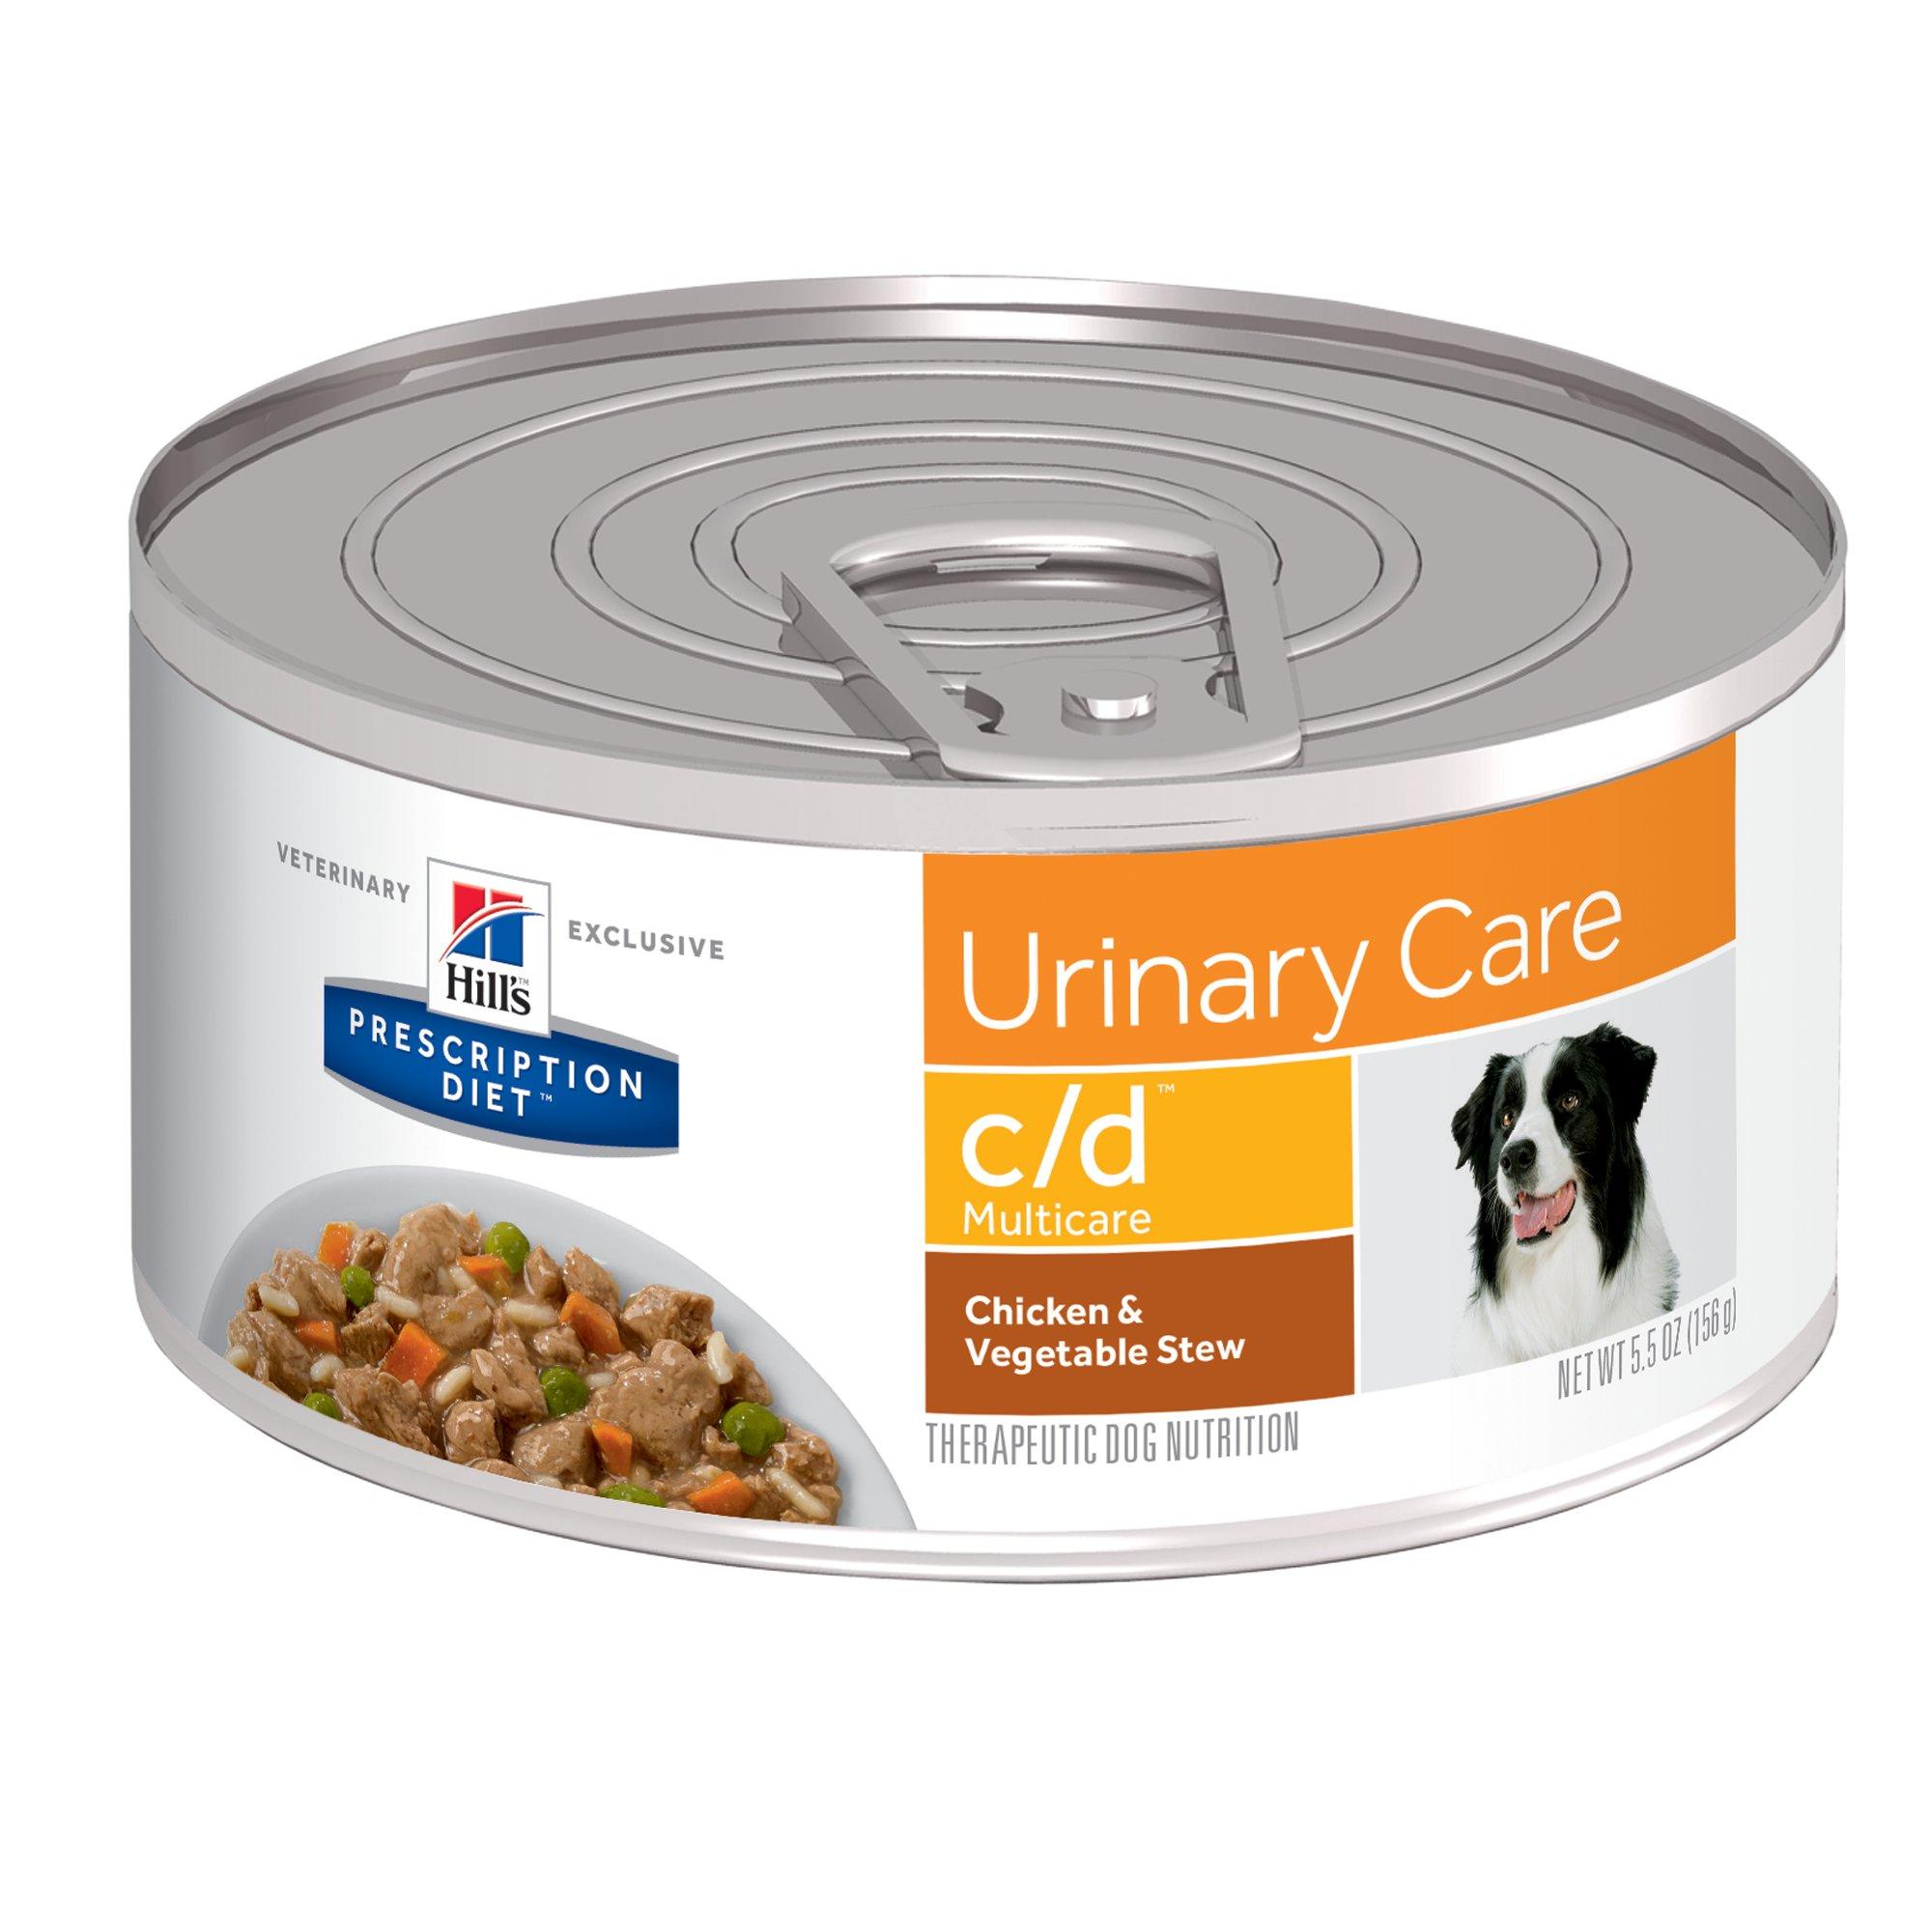 Cd Dog Food Price Comparison